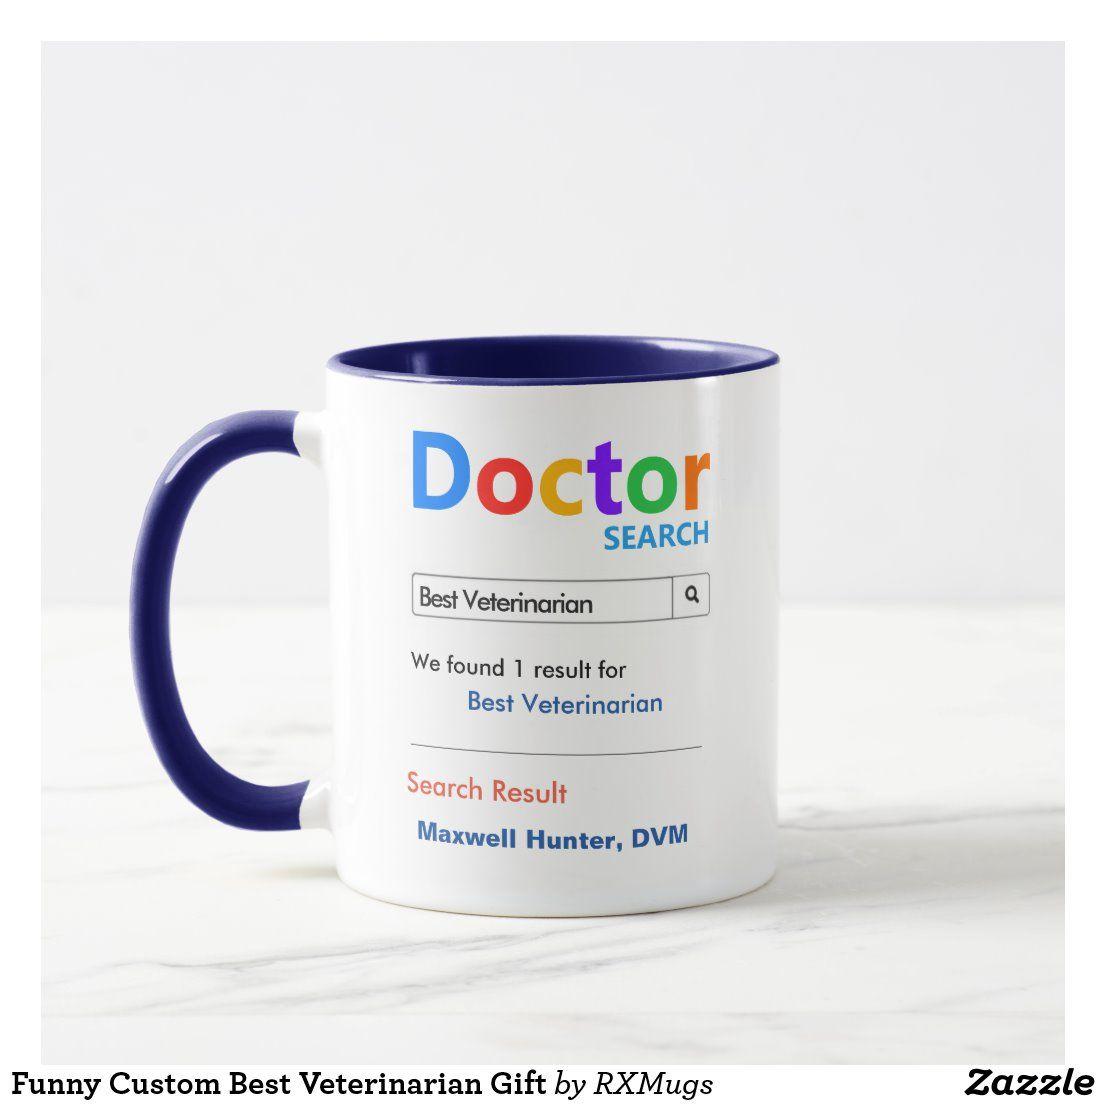 Funny custom best veterinarian gift mug